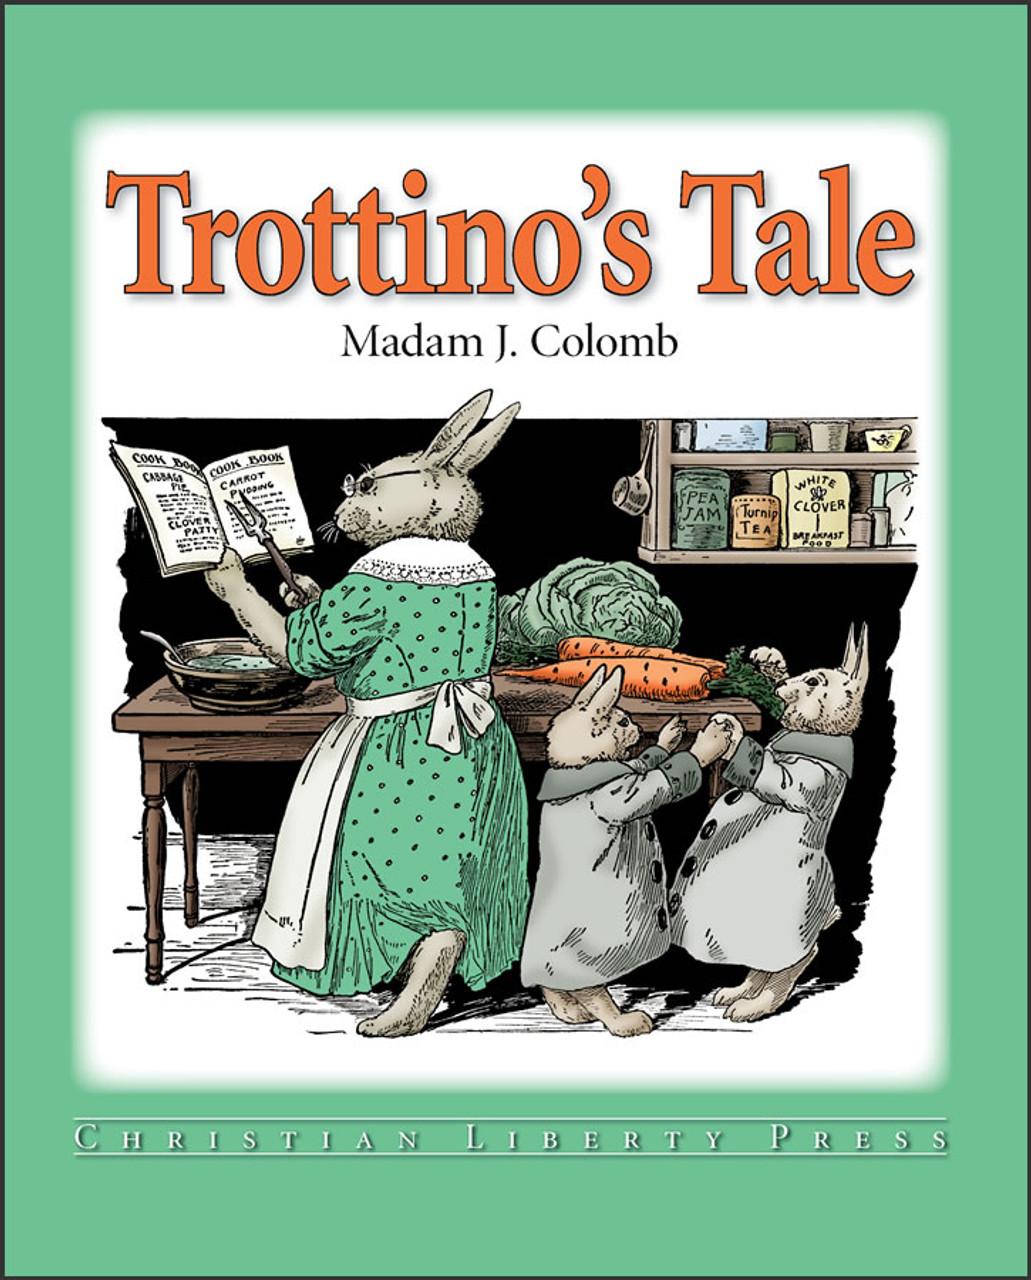 Trottino's Tale